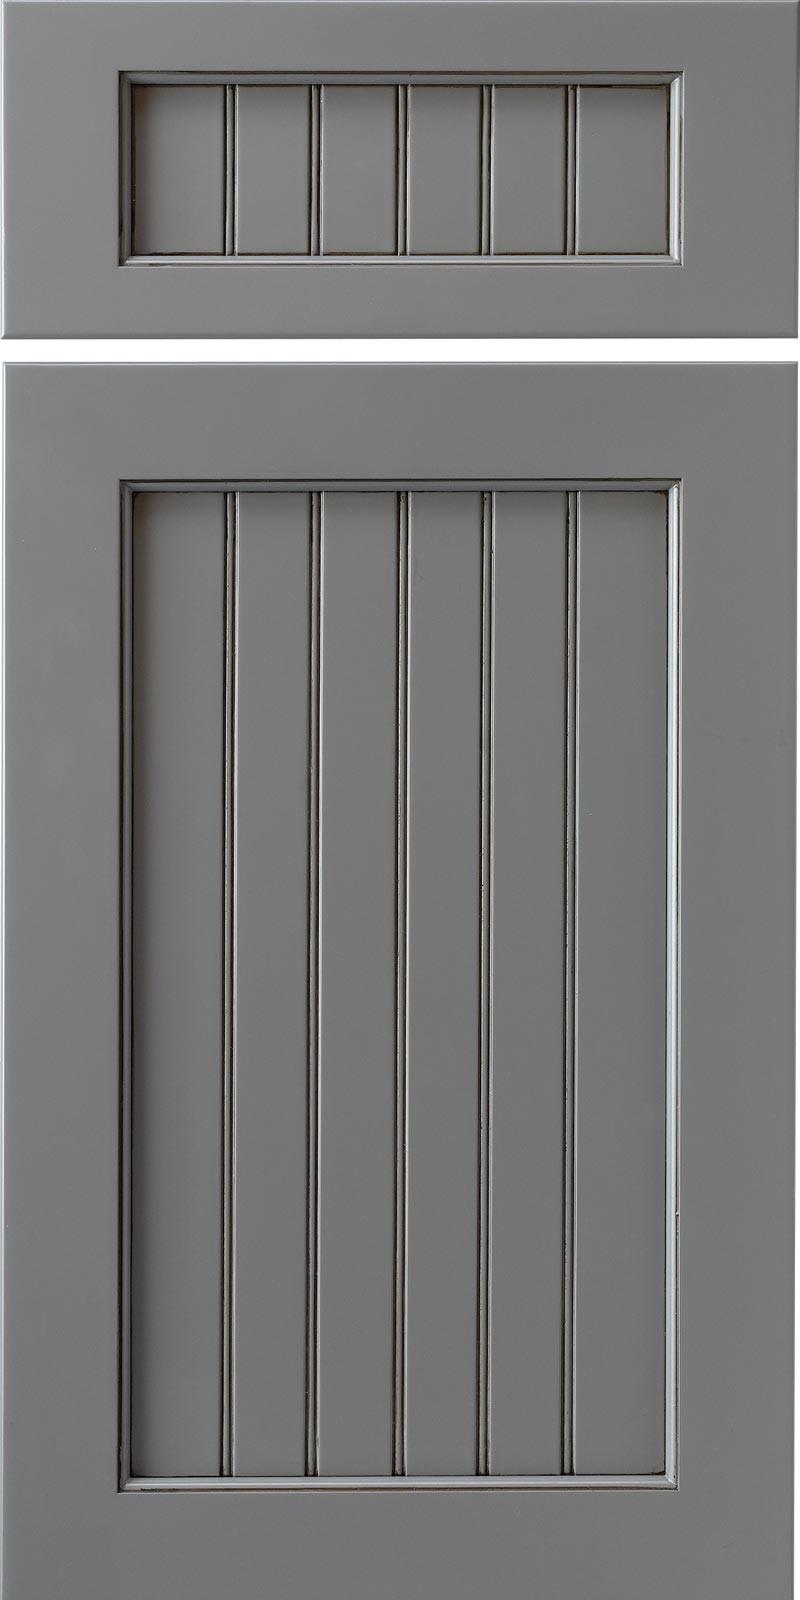 Yardley Five Piece Mdf Construction Cabinet Doors